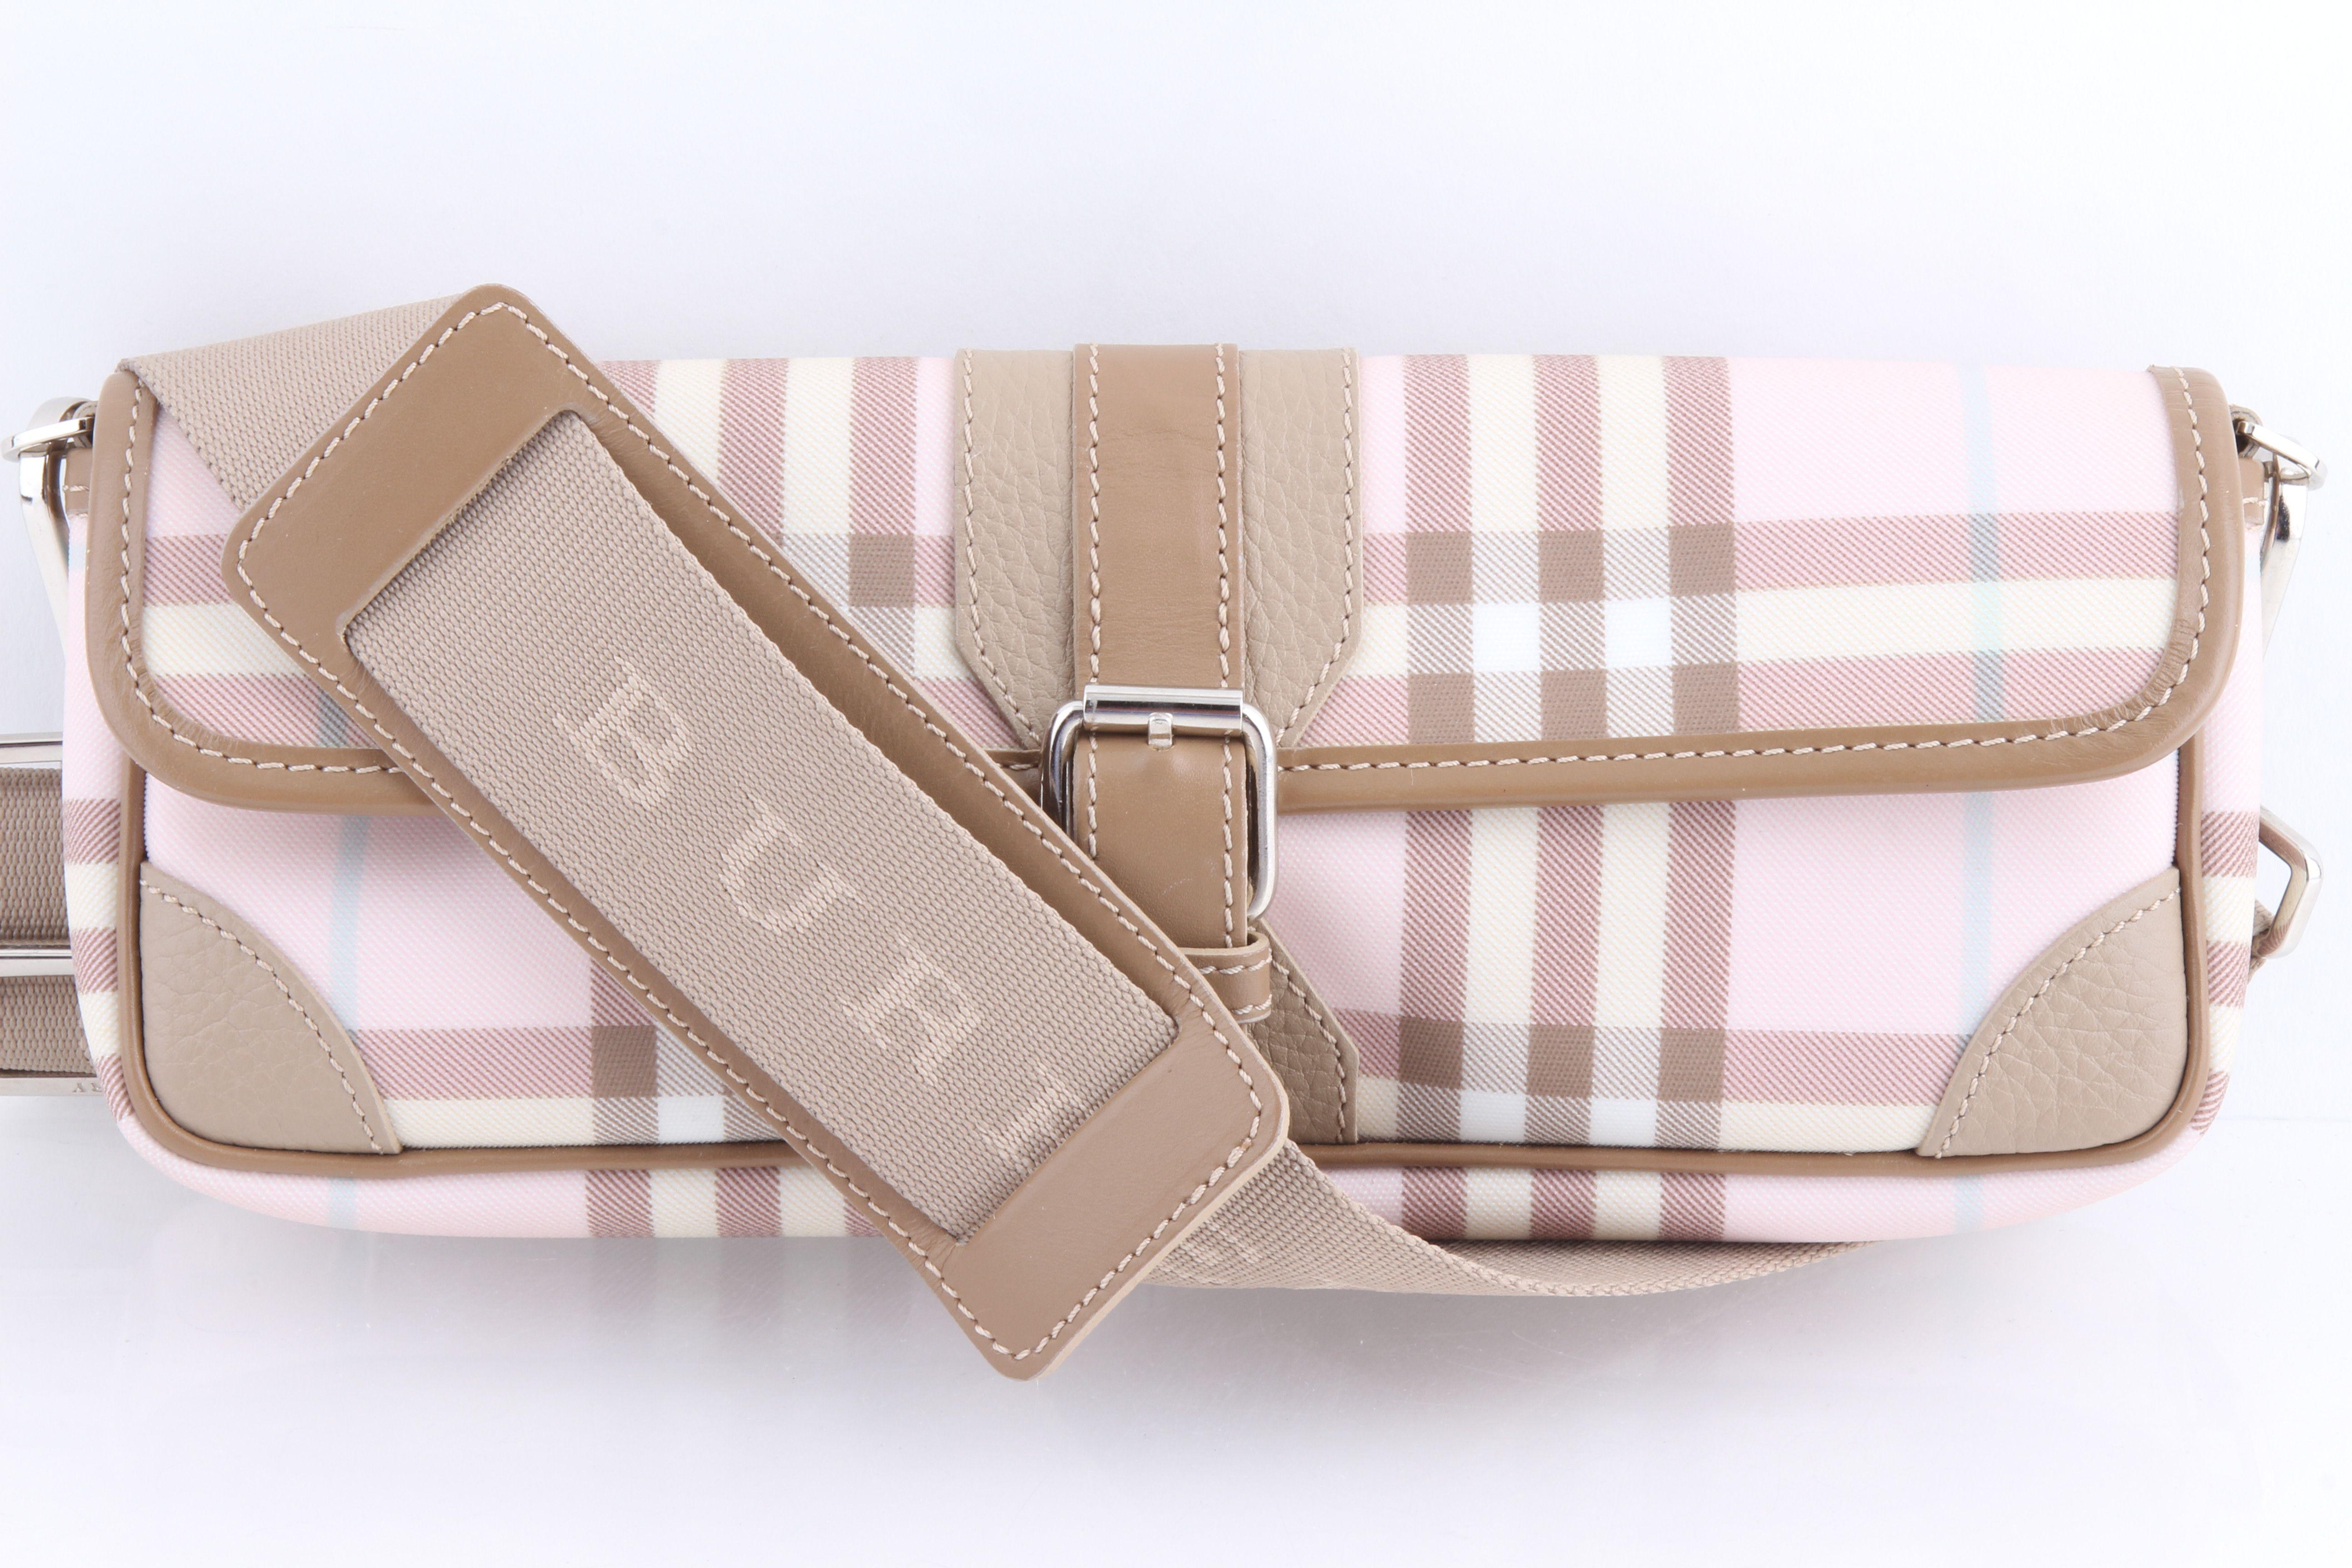 Nova Harley Elegant Baby Bag One Size, Pink